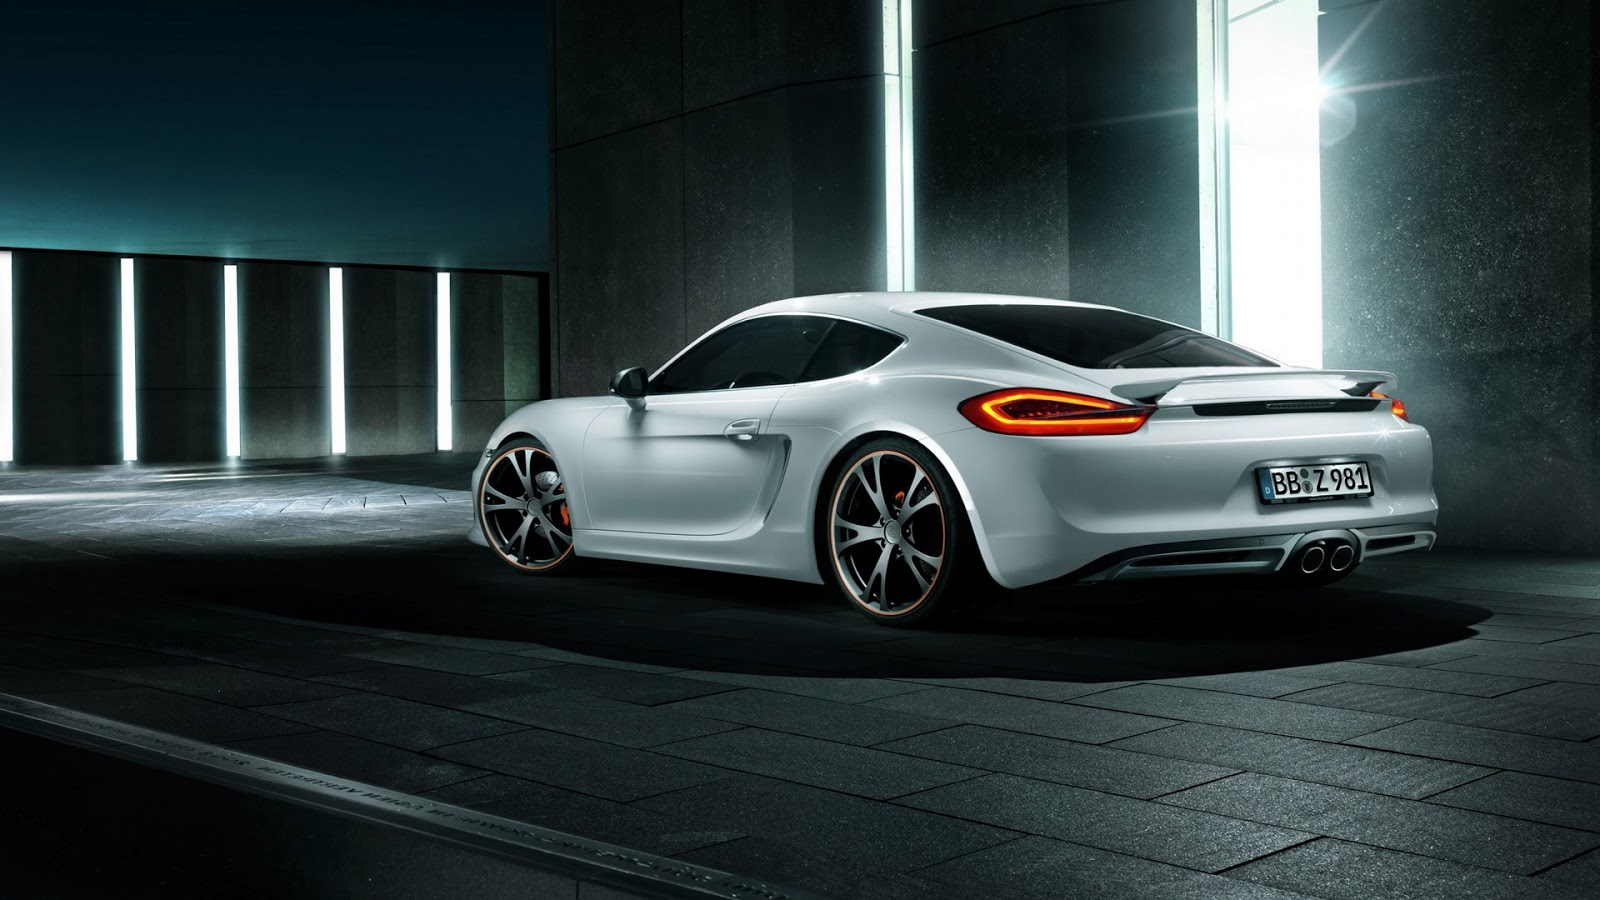 Porsche Panamera 911  № 2369970 загрузить